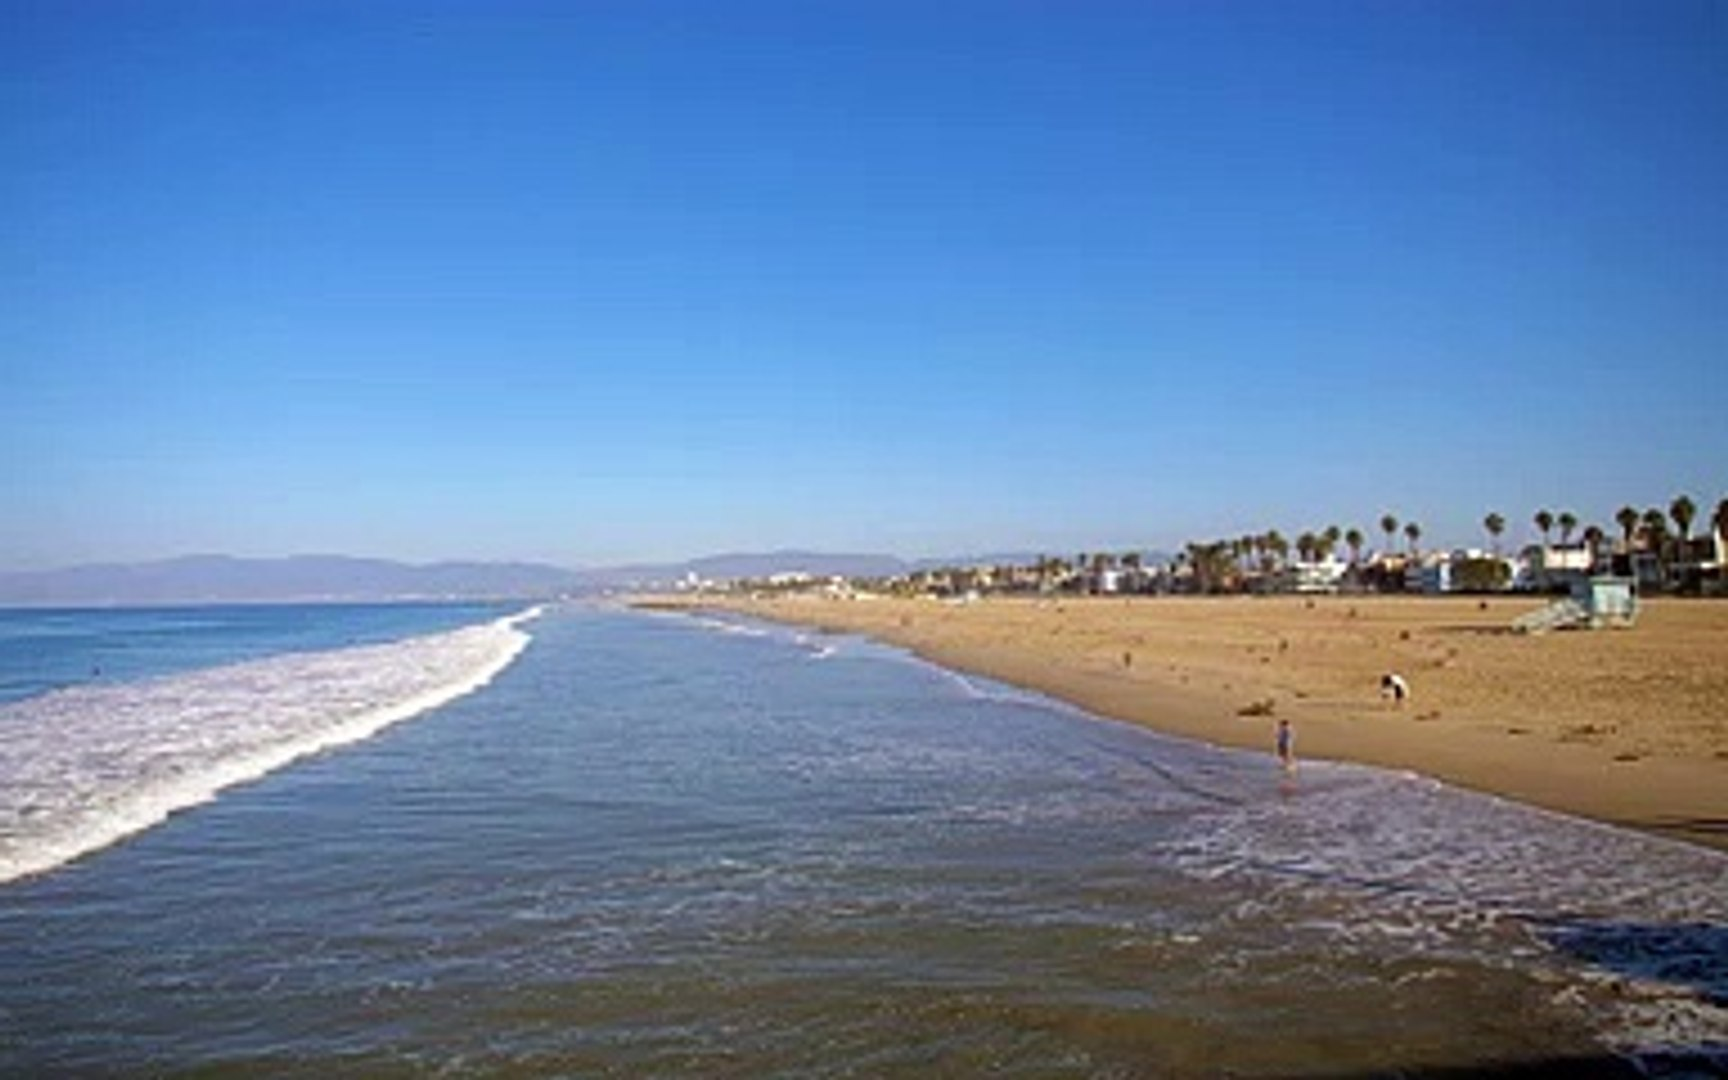 Waves on Venice Beach LA 久保田雅一郎